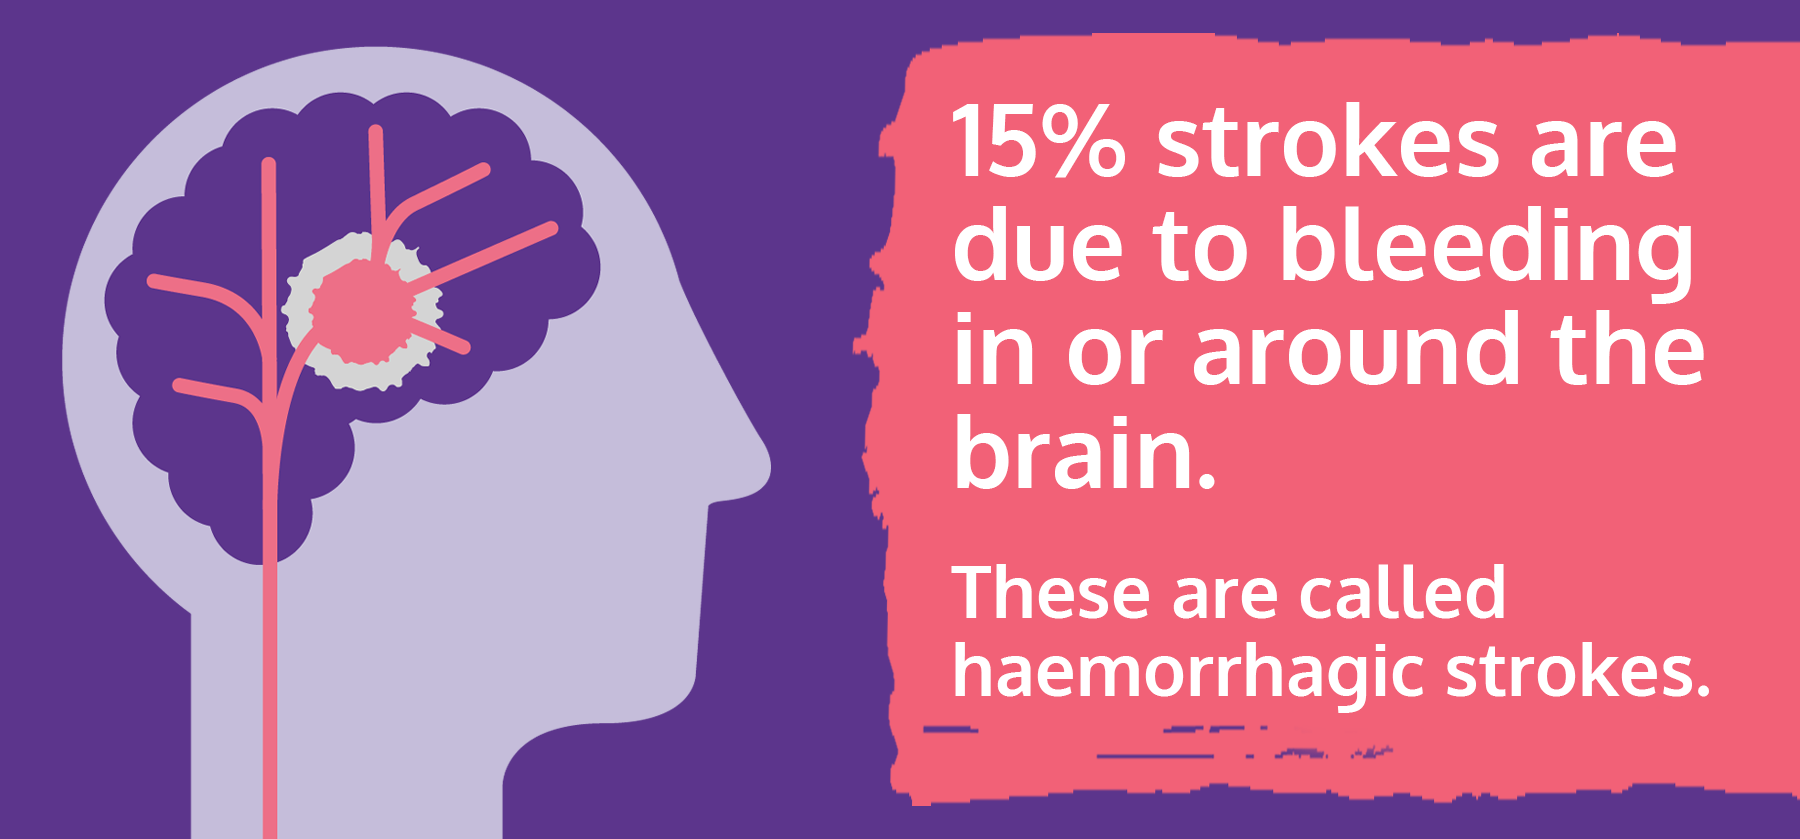 Hemorrhagic stroke info-graphic by the stroke association